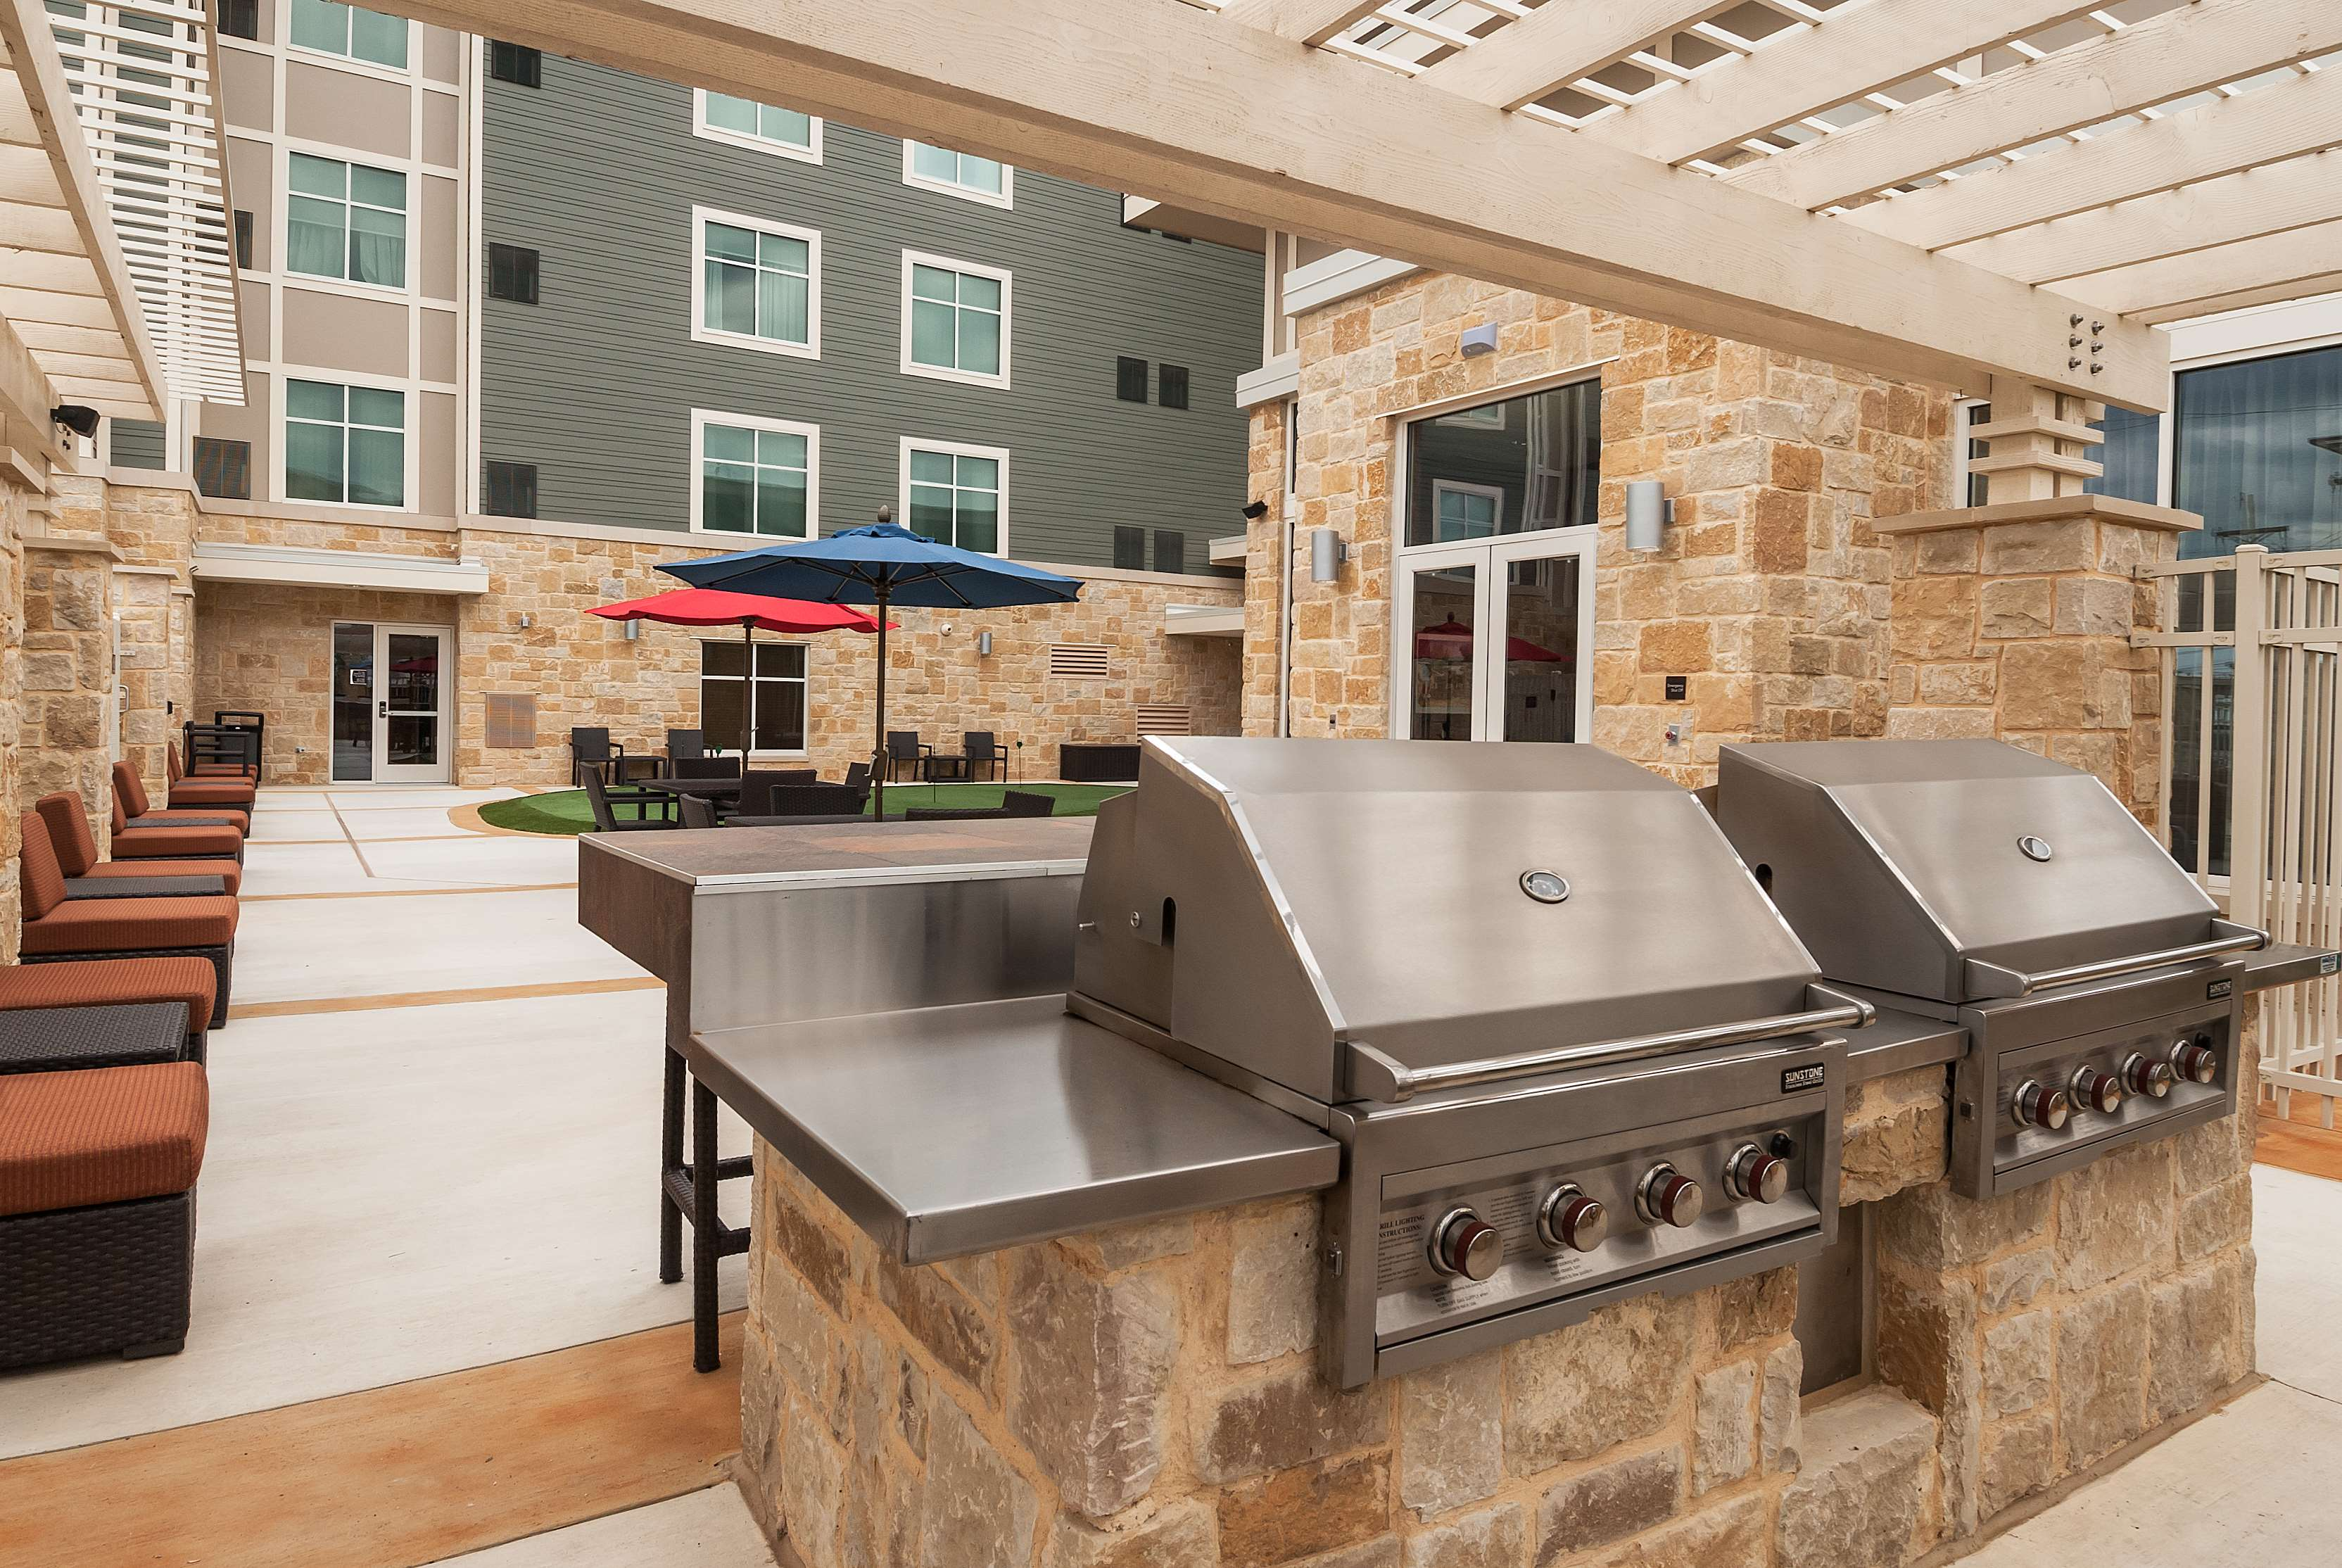 Homewood Suites by Hilton Fort Worth - Medical Center, TX image 6